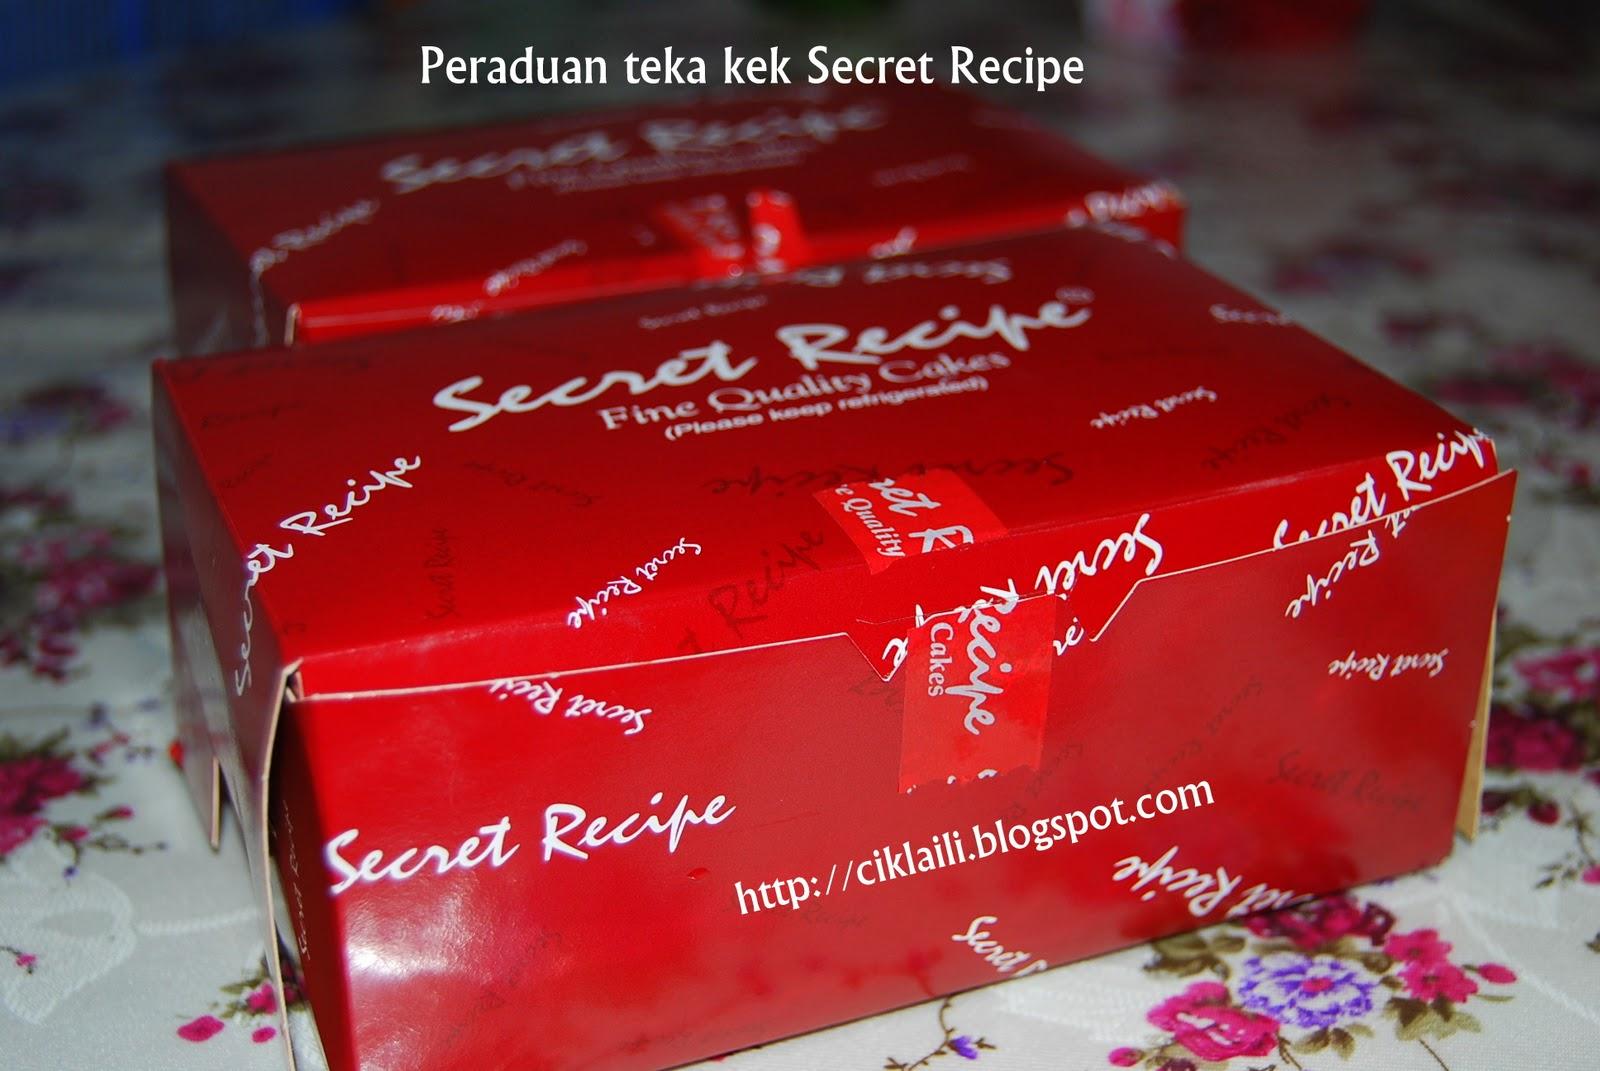 Peraduan Teka Kek Secret Recipe Ciklaili